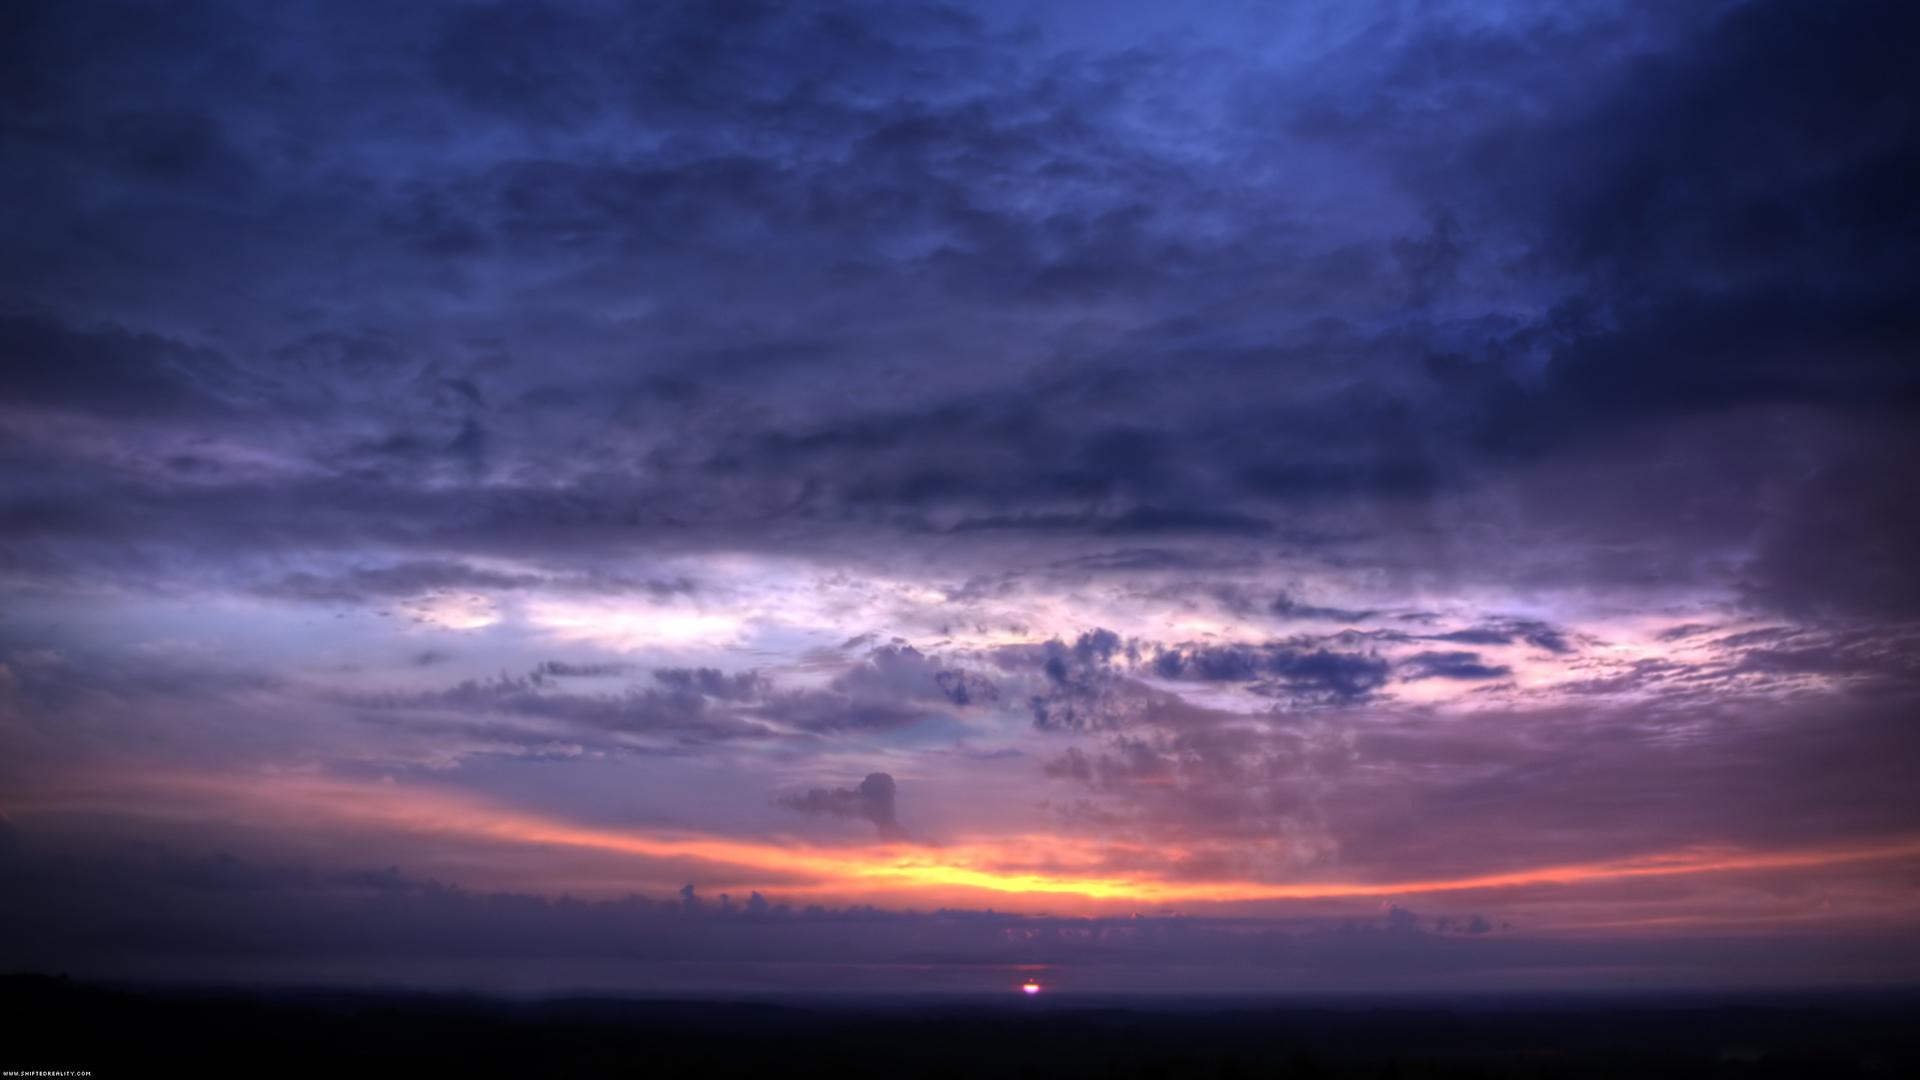 Download Sunset Landscapes Wallpaper 1920x1080 Wallpoper 1920x1080